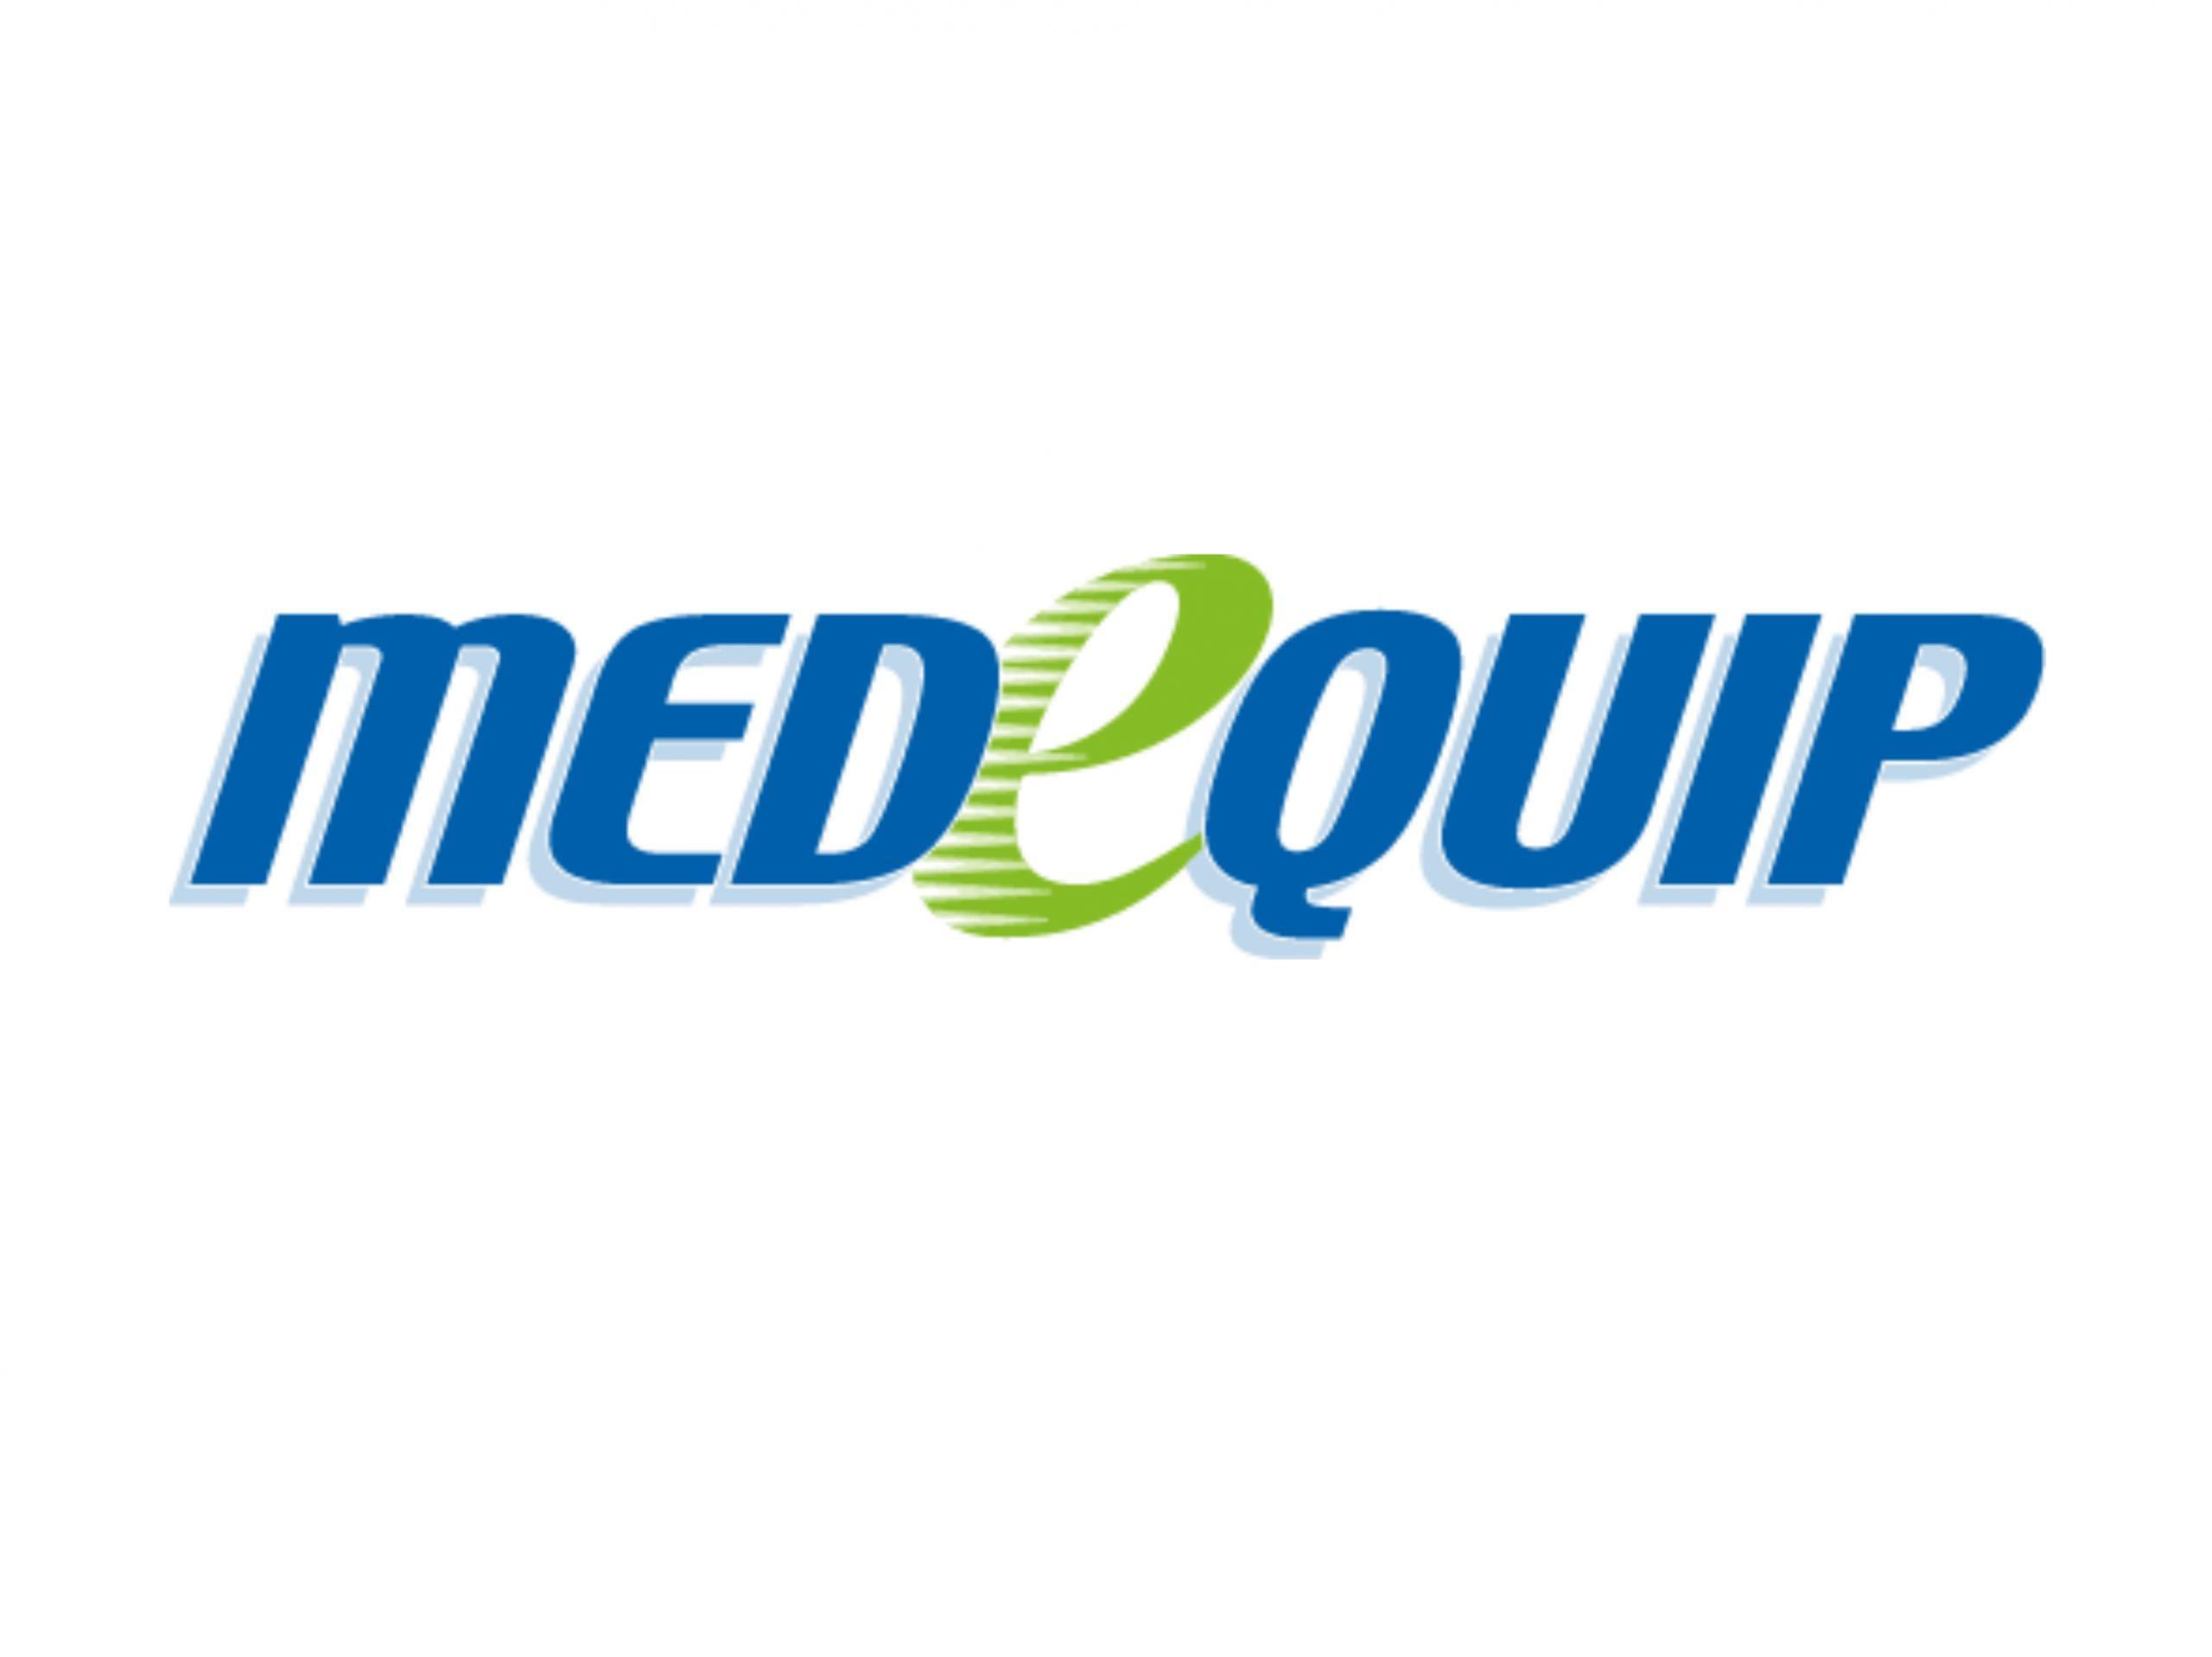 Medequip begins Electric Vehicle Trials in Rochester